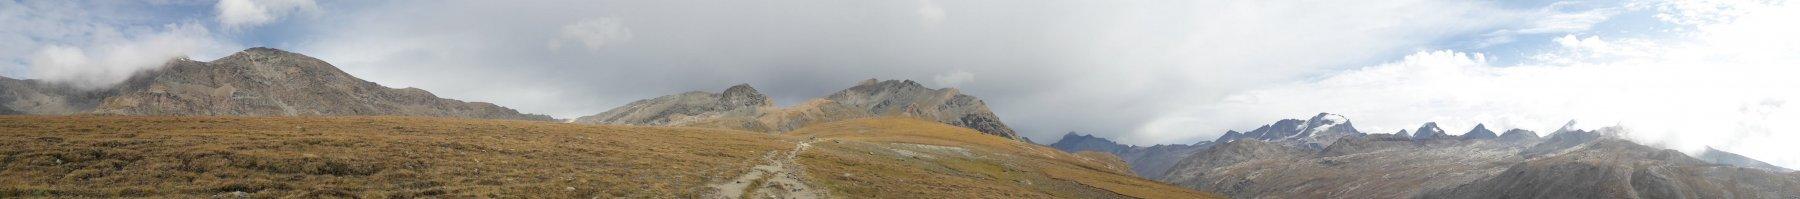 Panorama a 360° nei pressi del lago Rosset